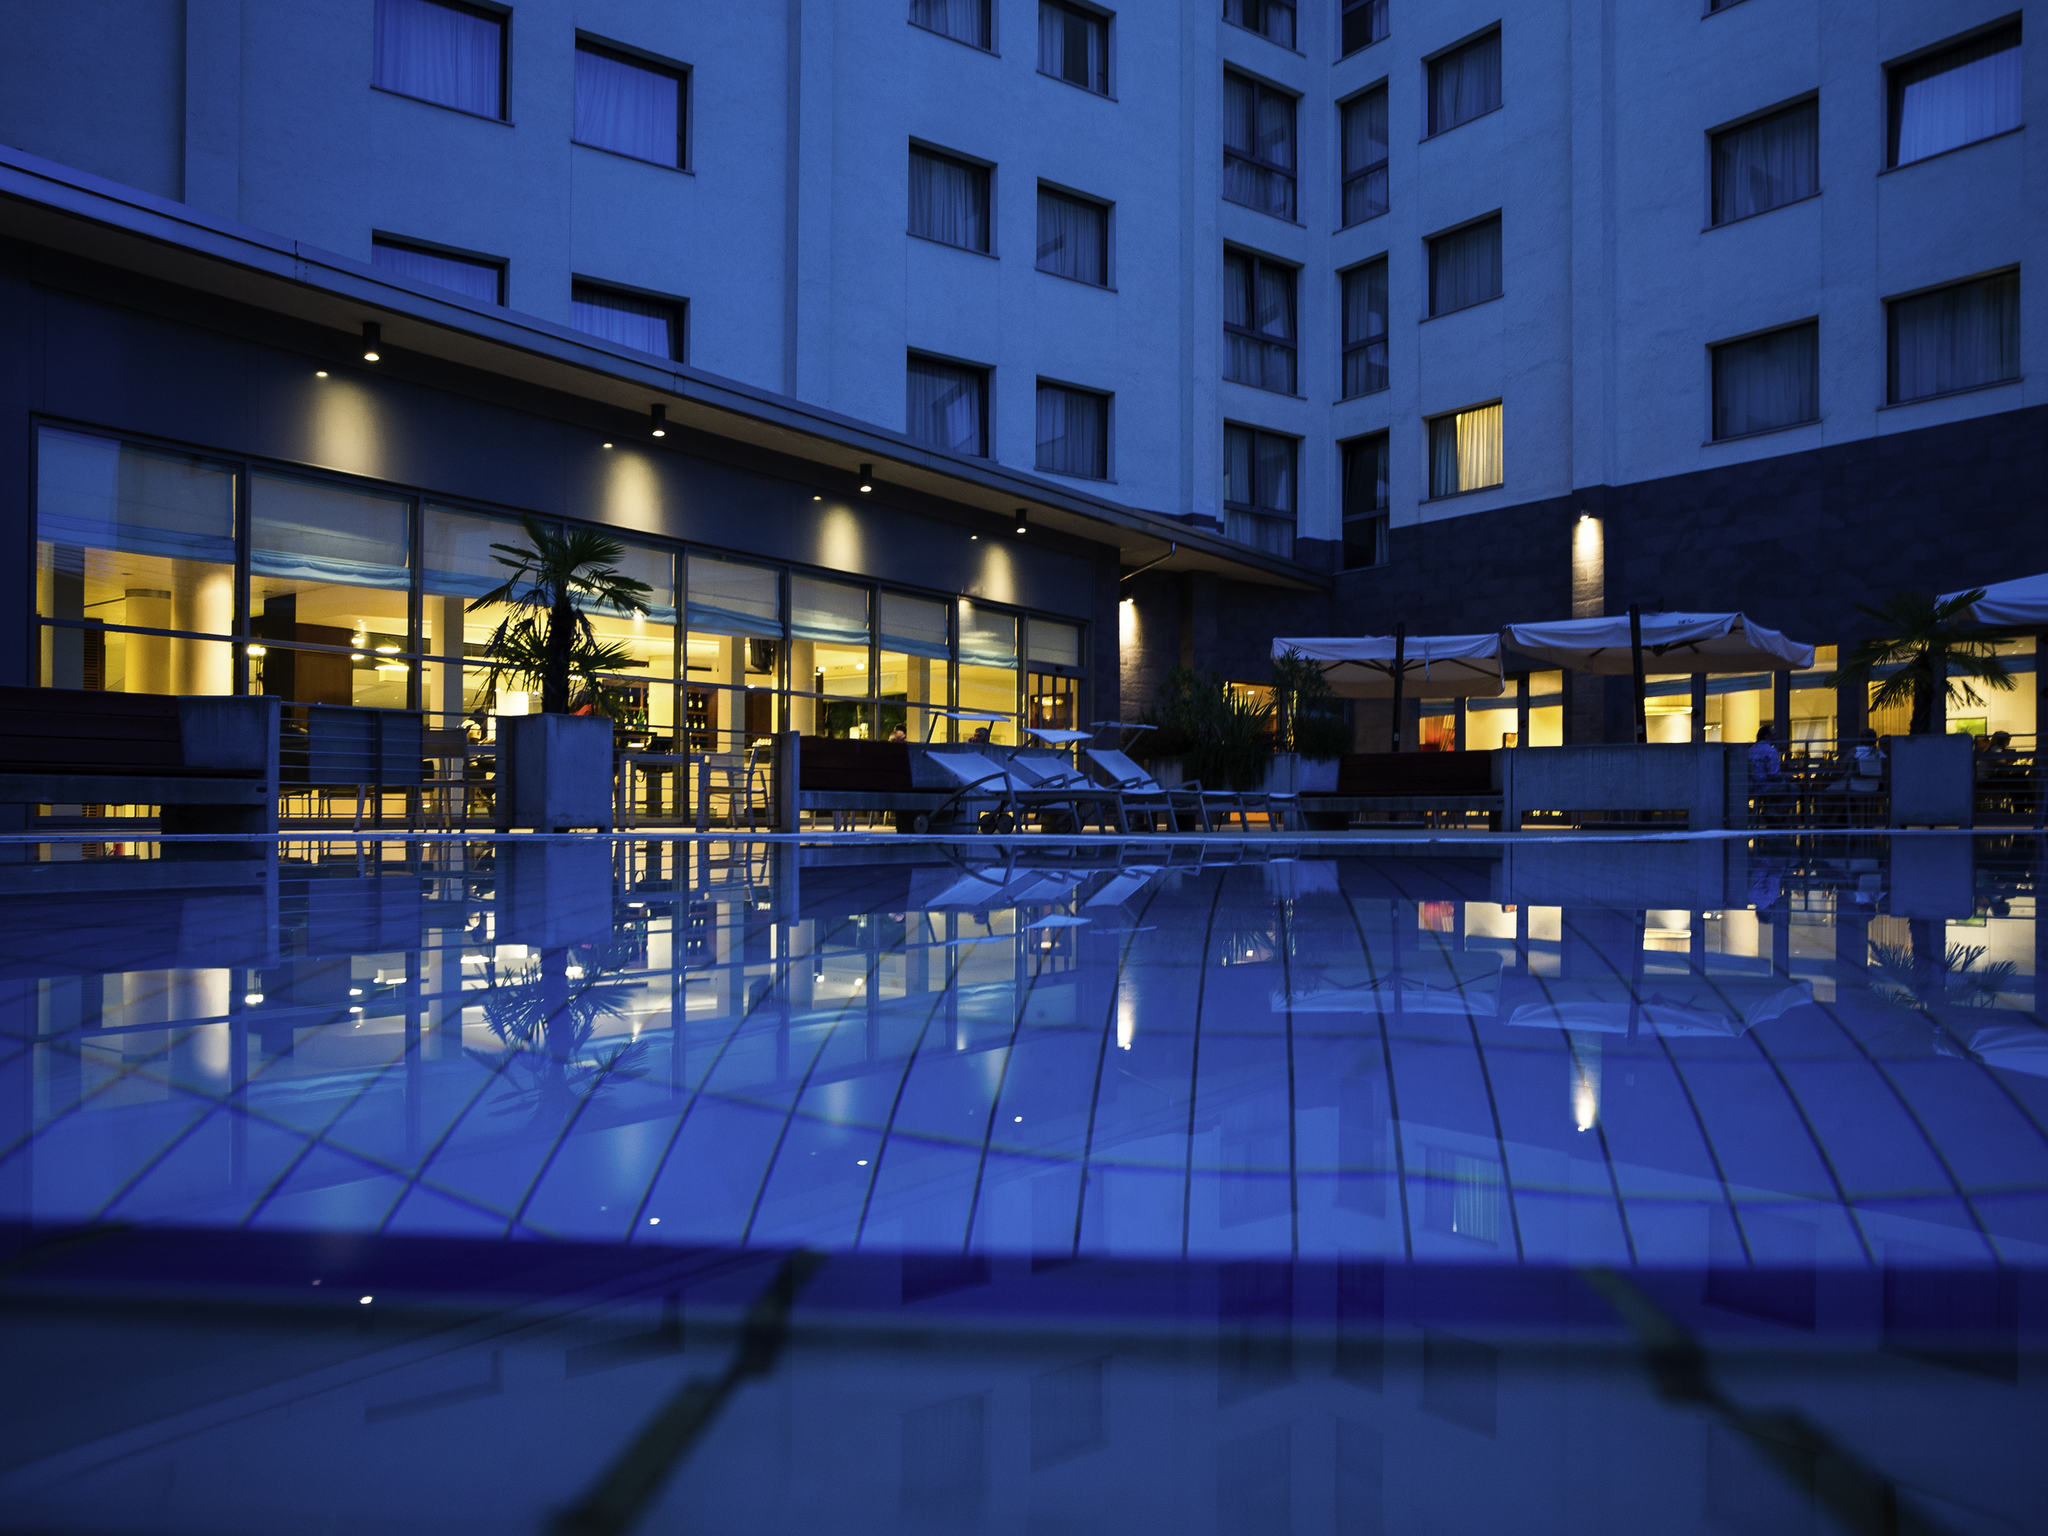 فندق - فندق نوفوتيل Novotel ميلانو مالبينسا إيربورت